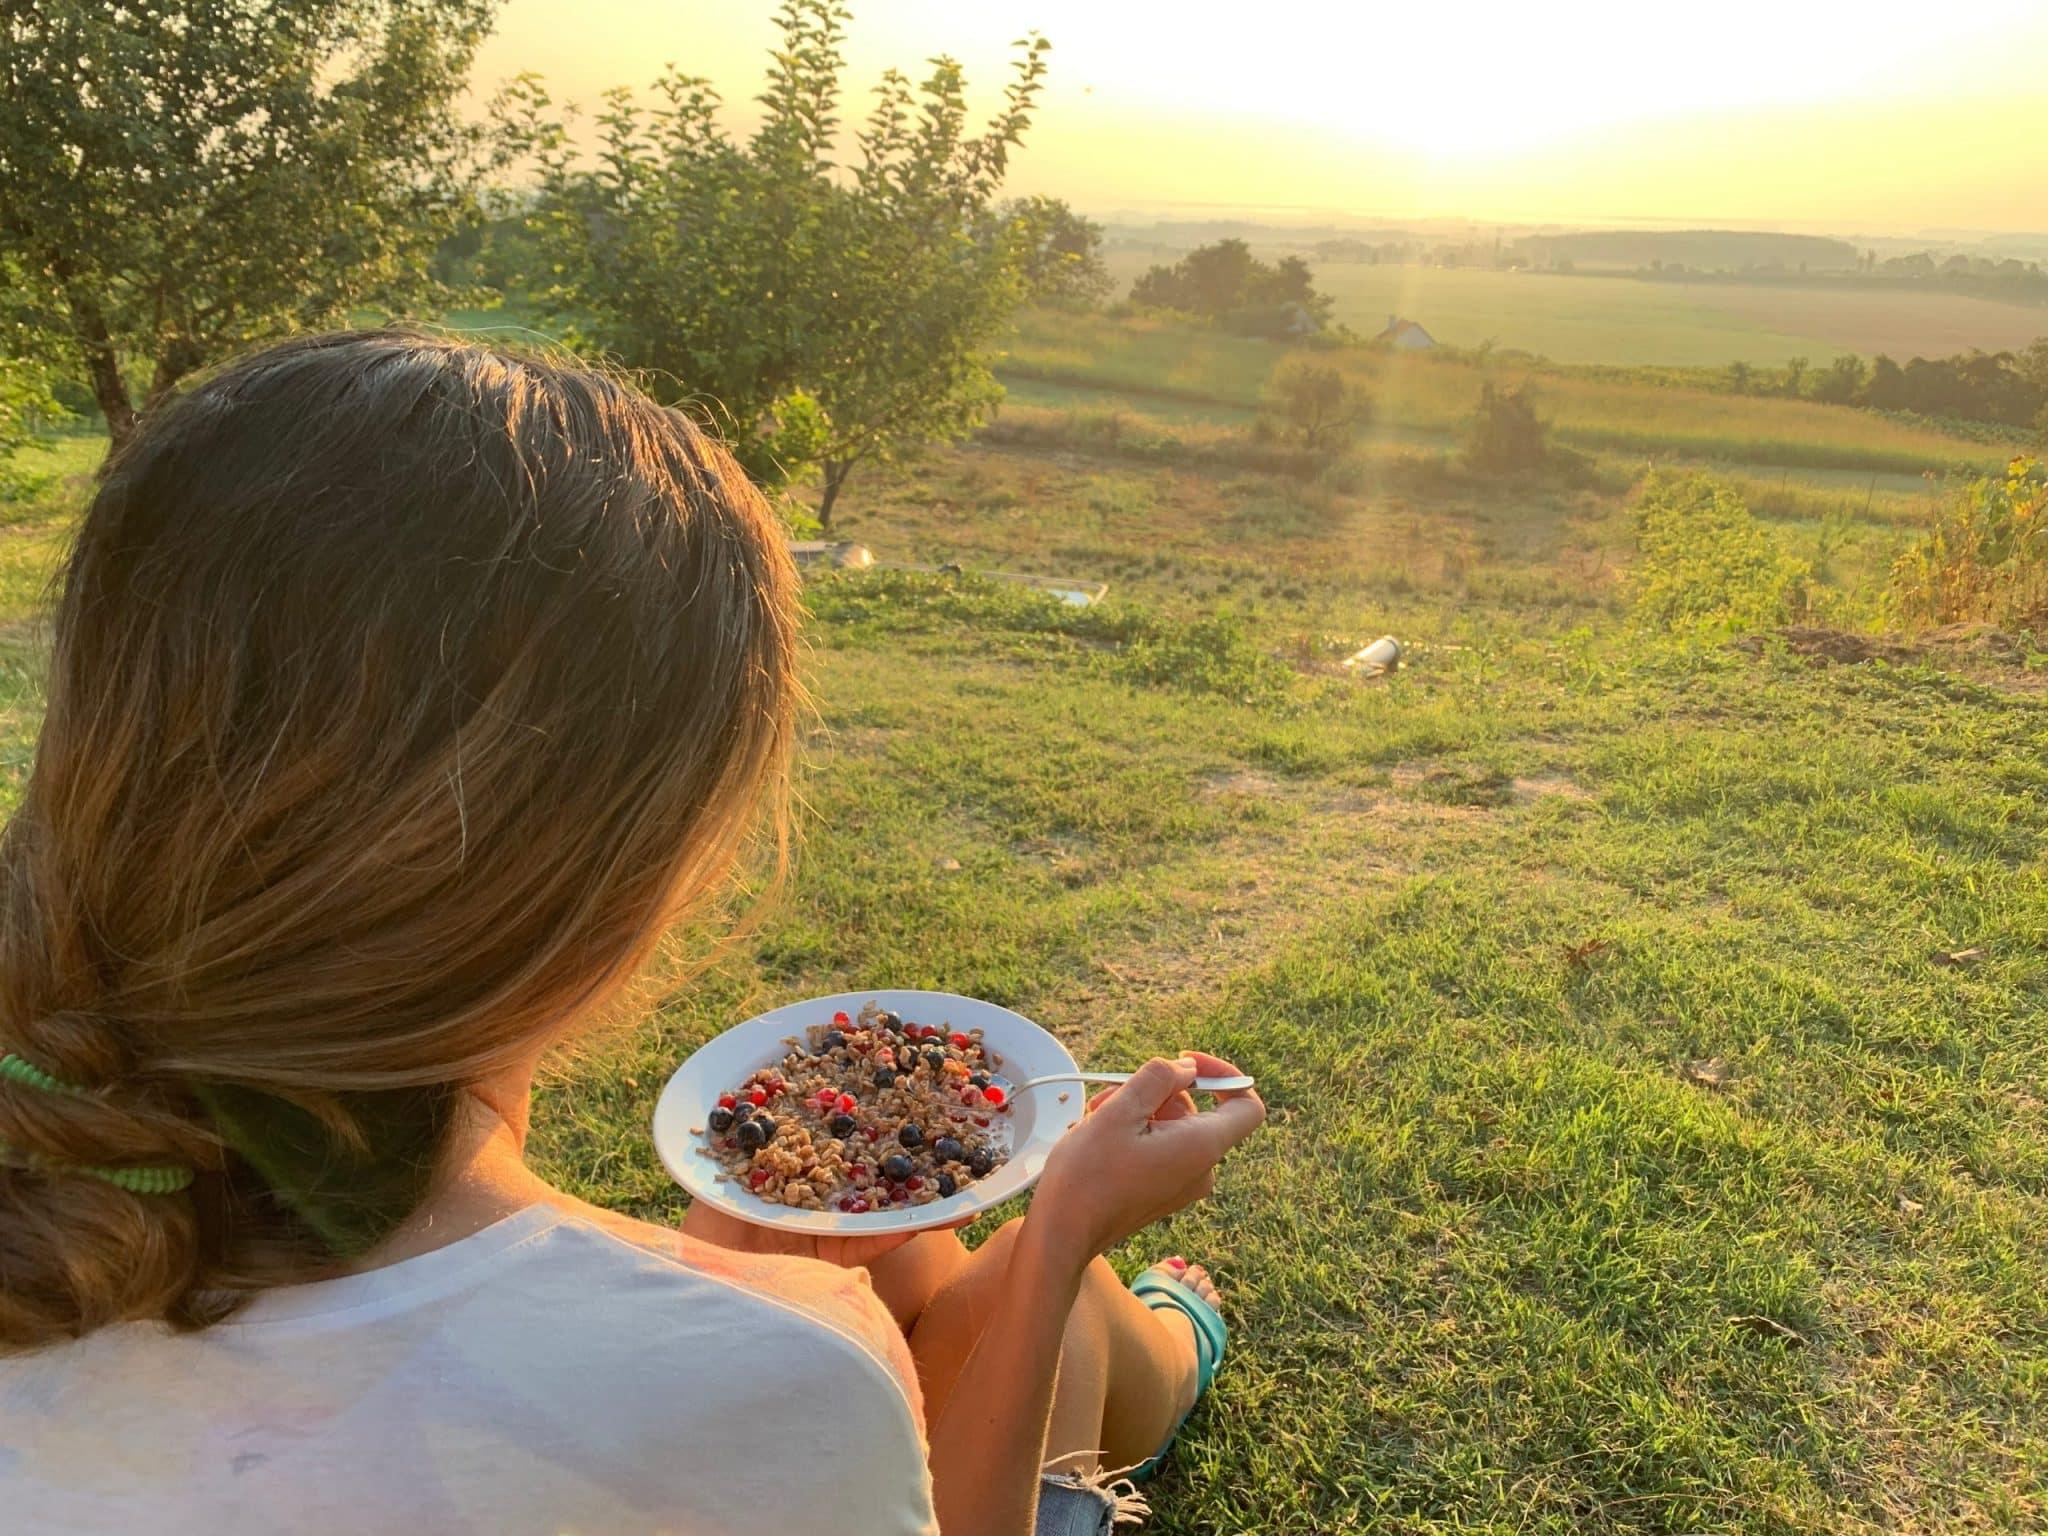 O usoara alergare urmata de un mic dejun la rasarit in Ungaria